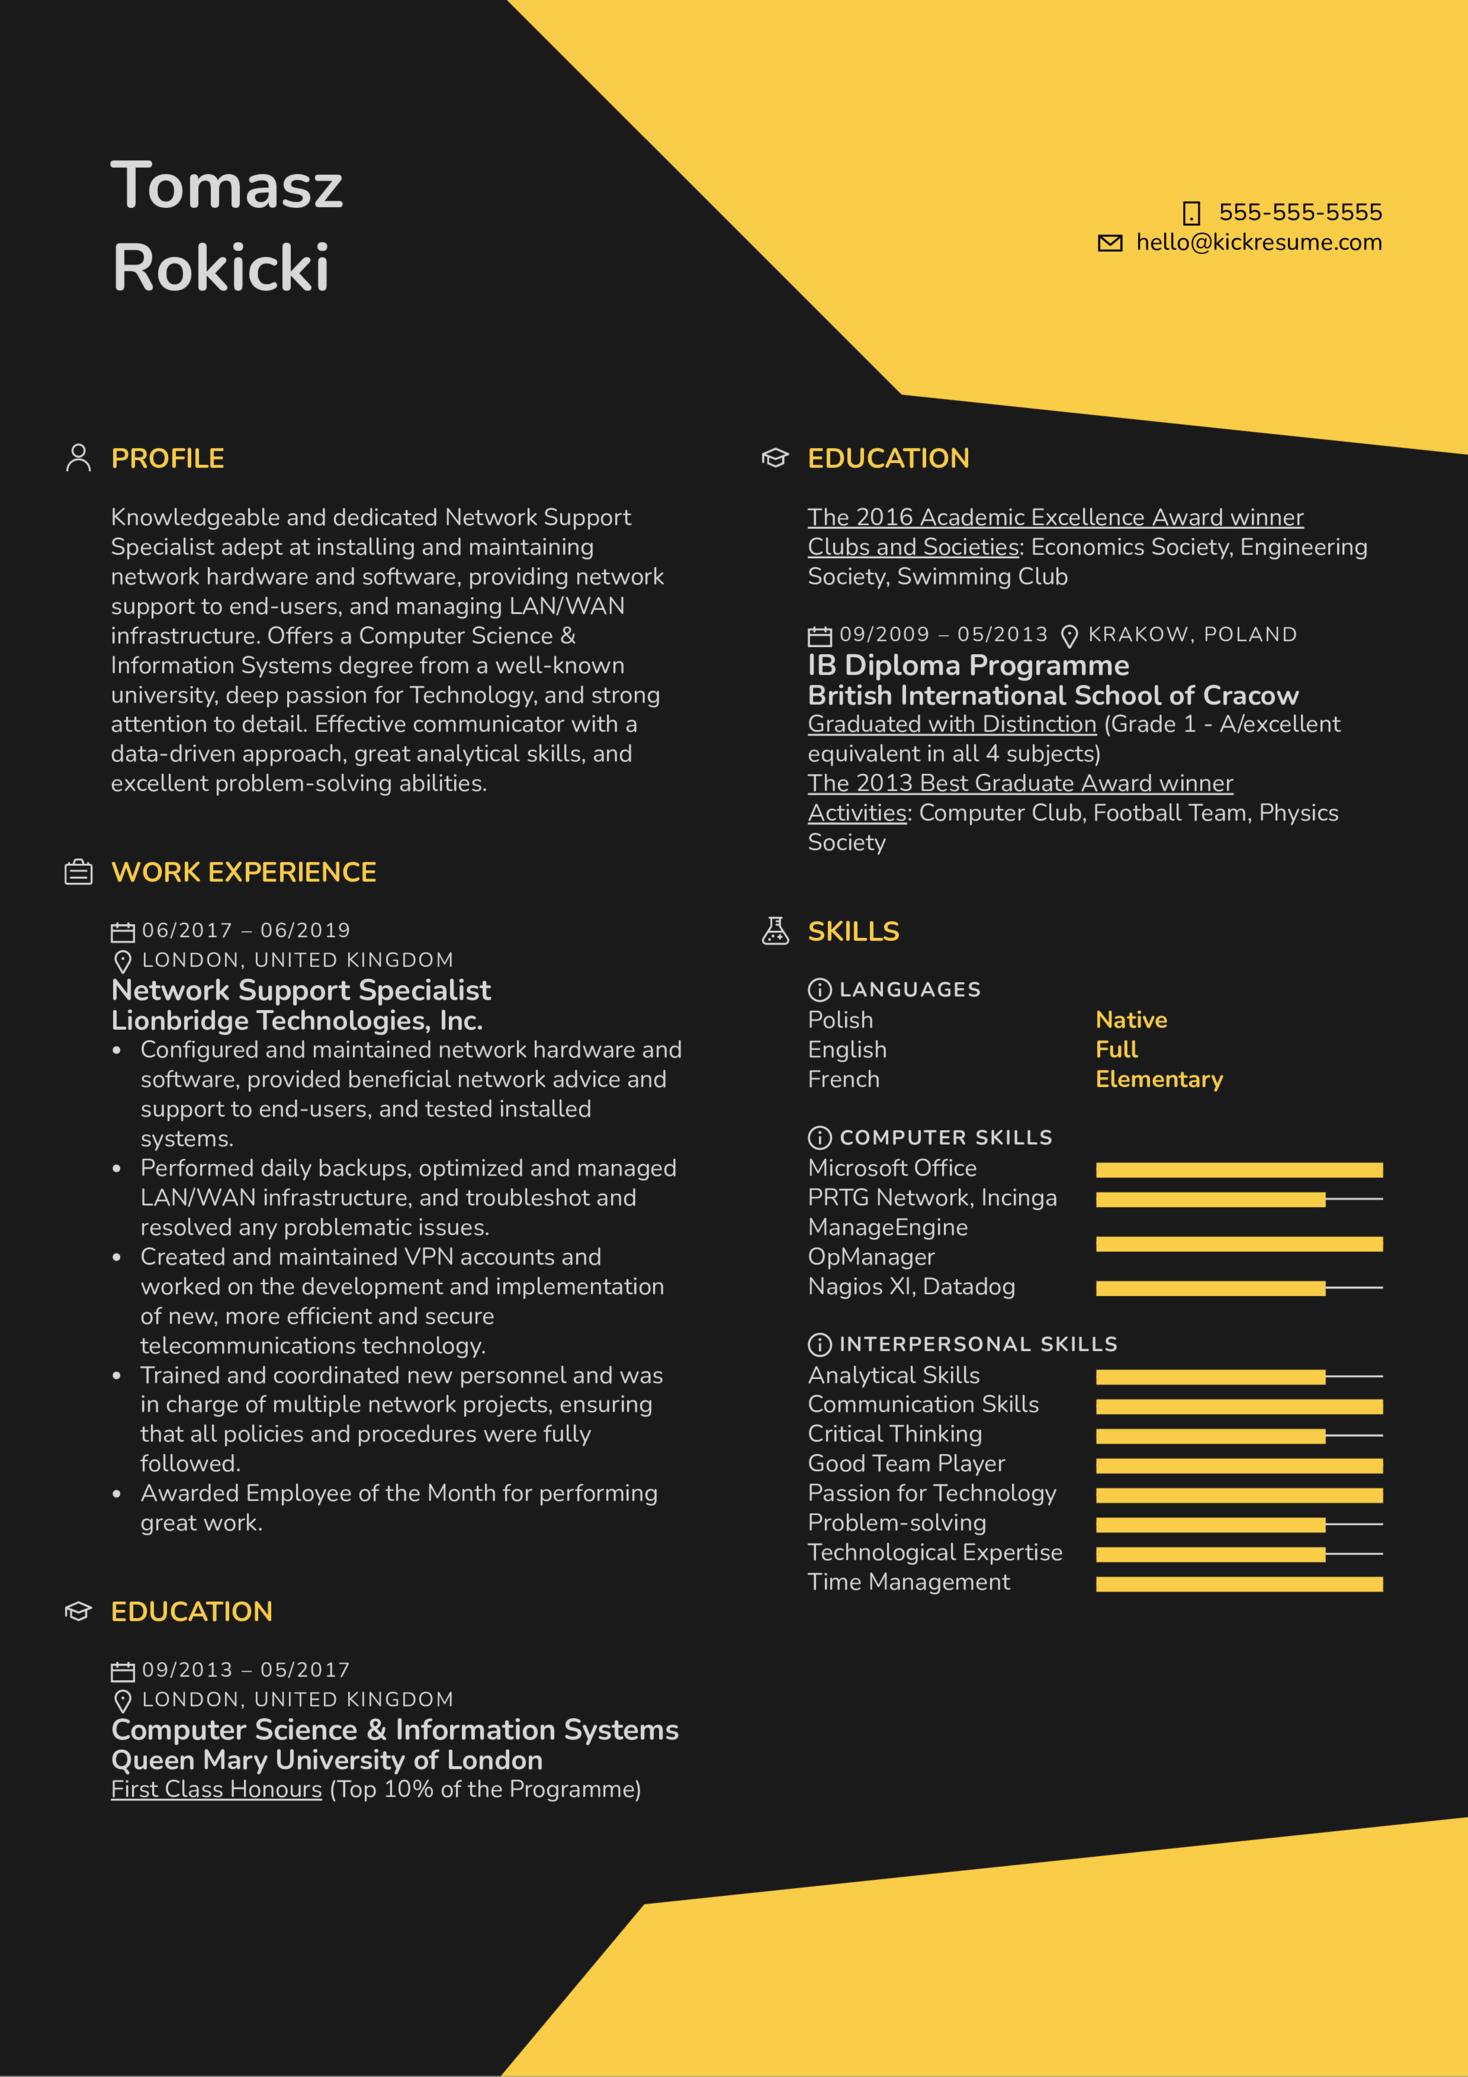 Network Support Specialist Resume Sample (časť 1)